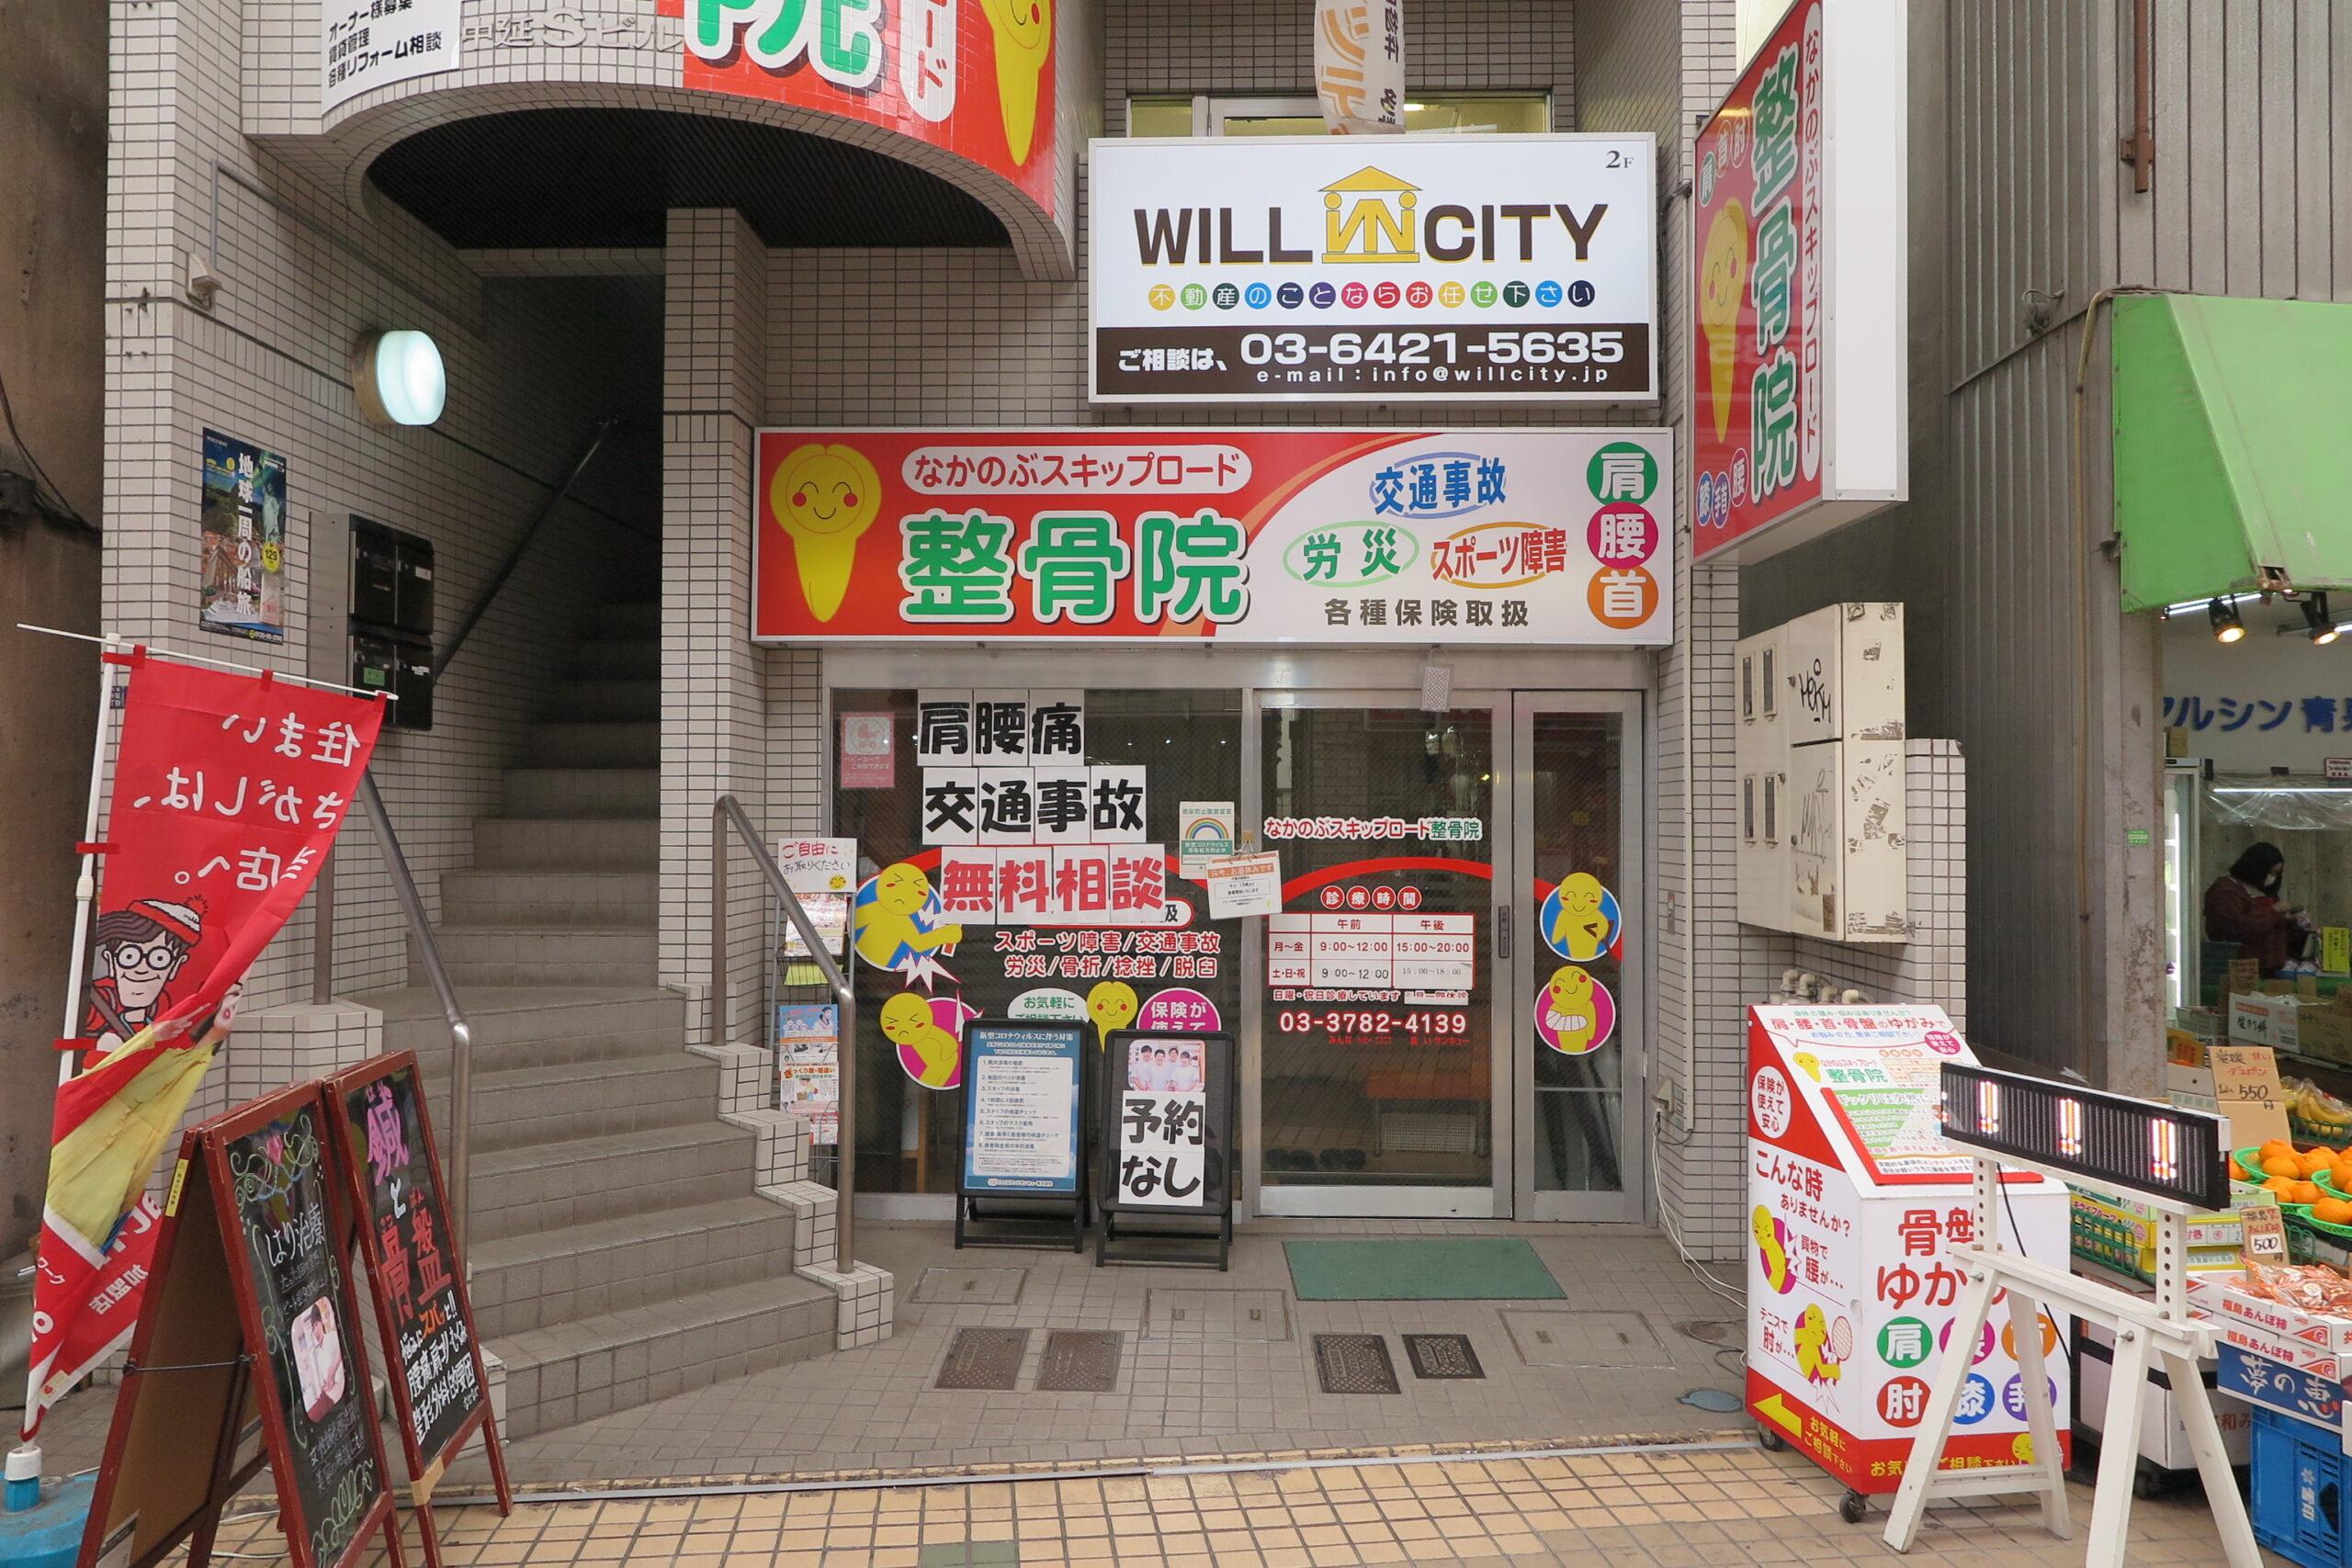 https://nakanobu.com/wp-content/uploads/2021/04/21823545c08f1cde39889940a8bd29a1-scaled.jpg